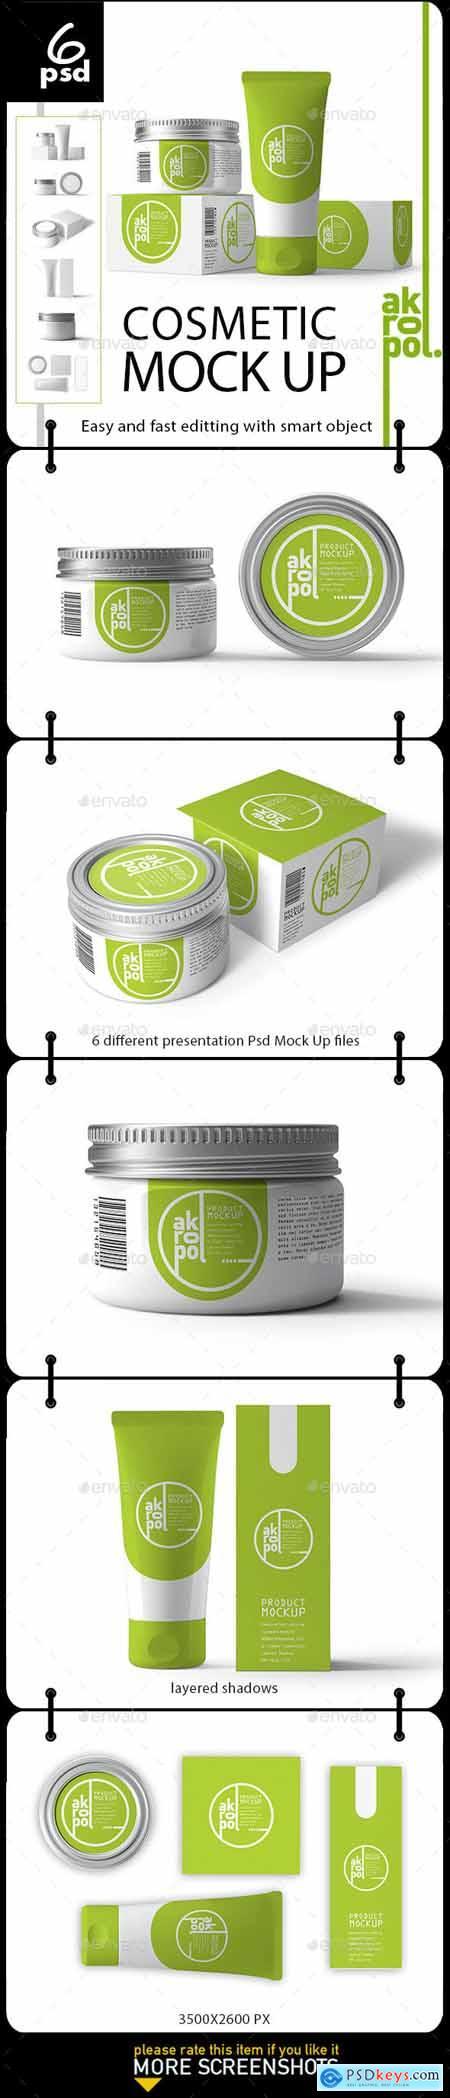 Cosmetic Mock Up 23879356